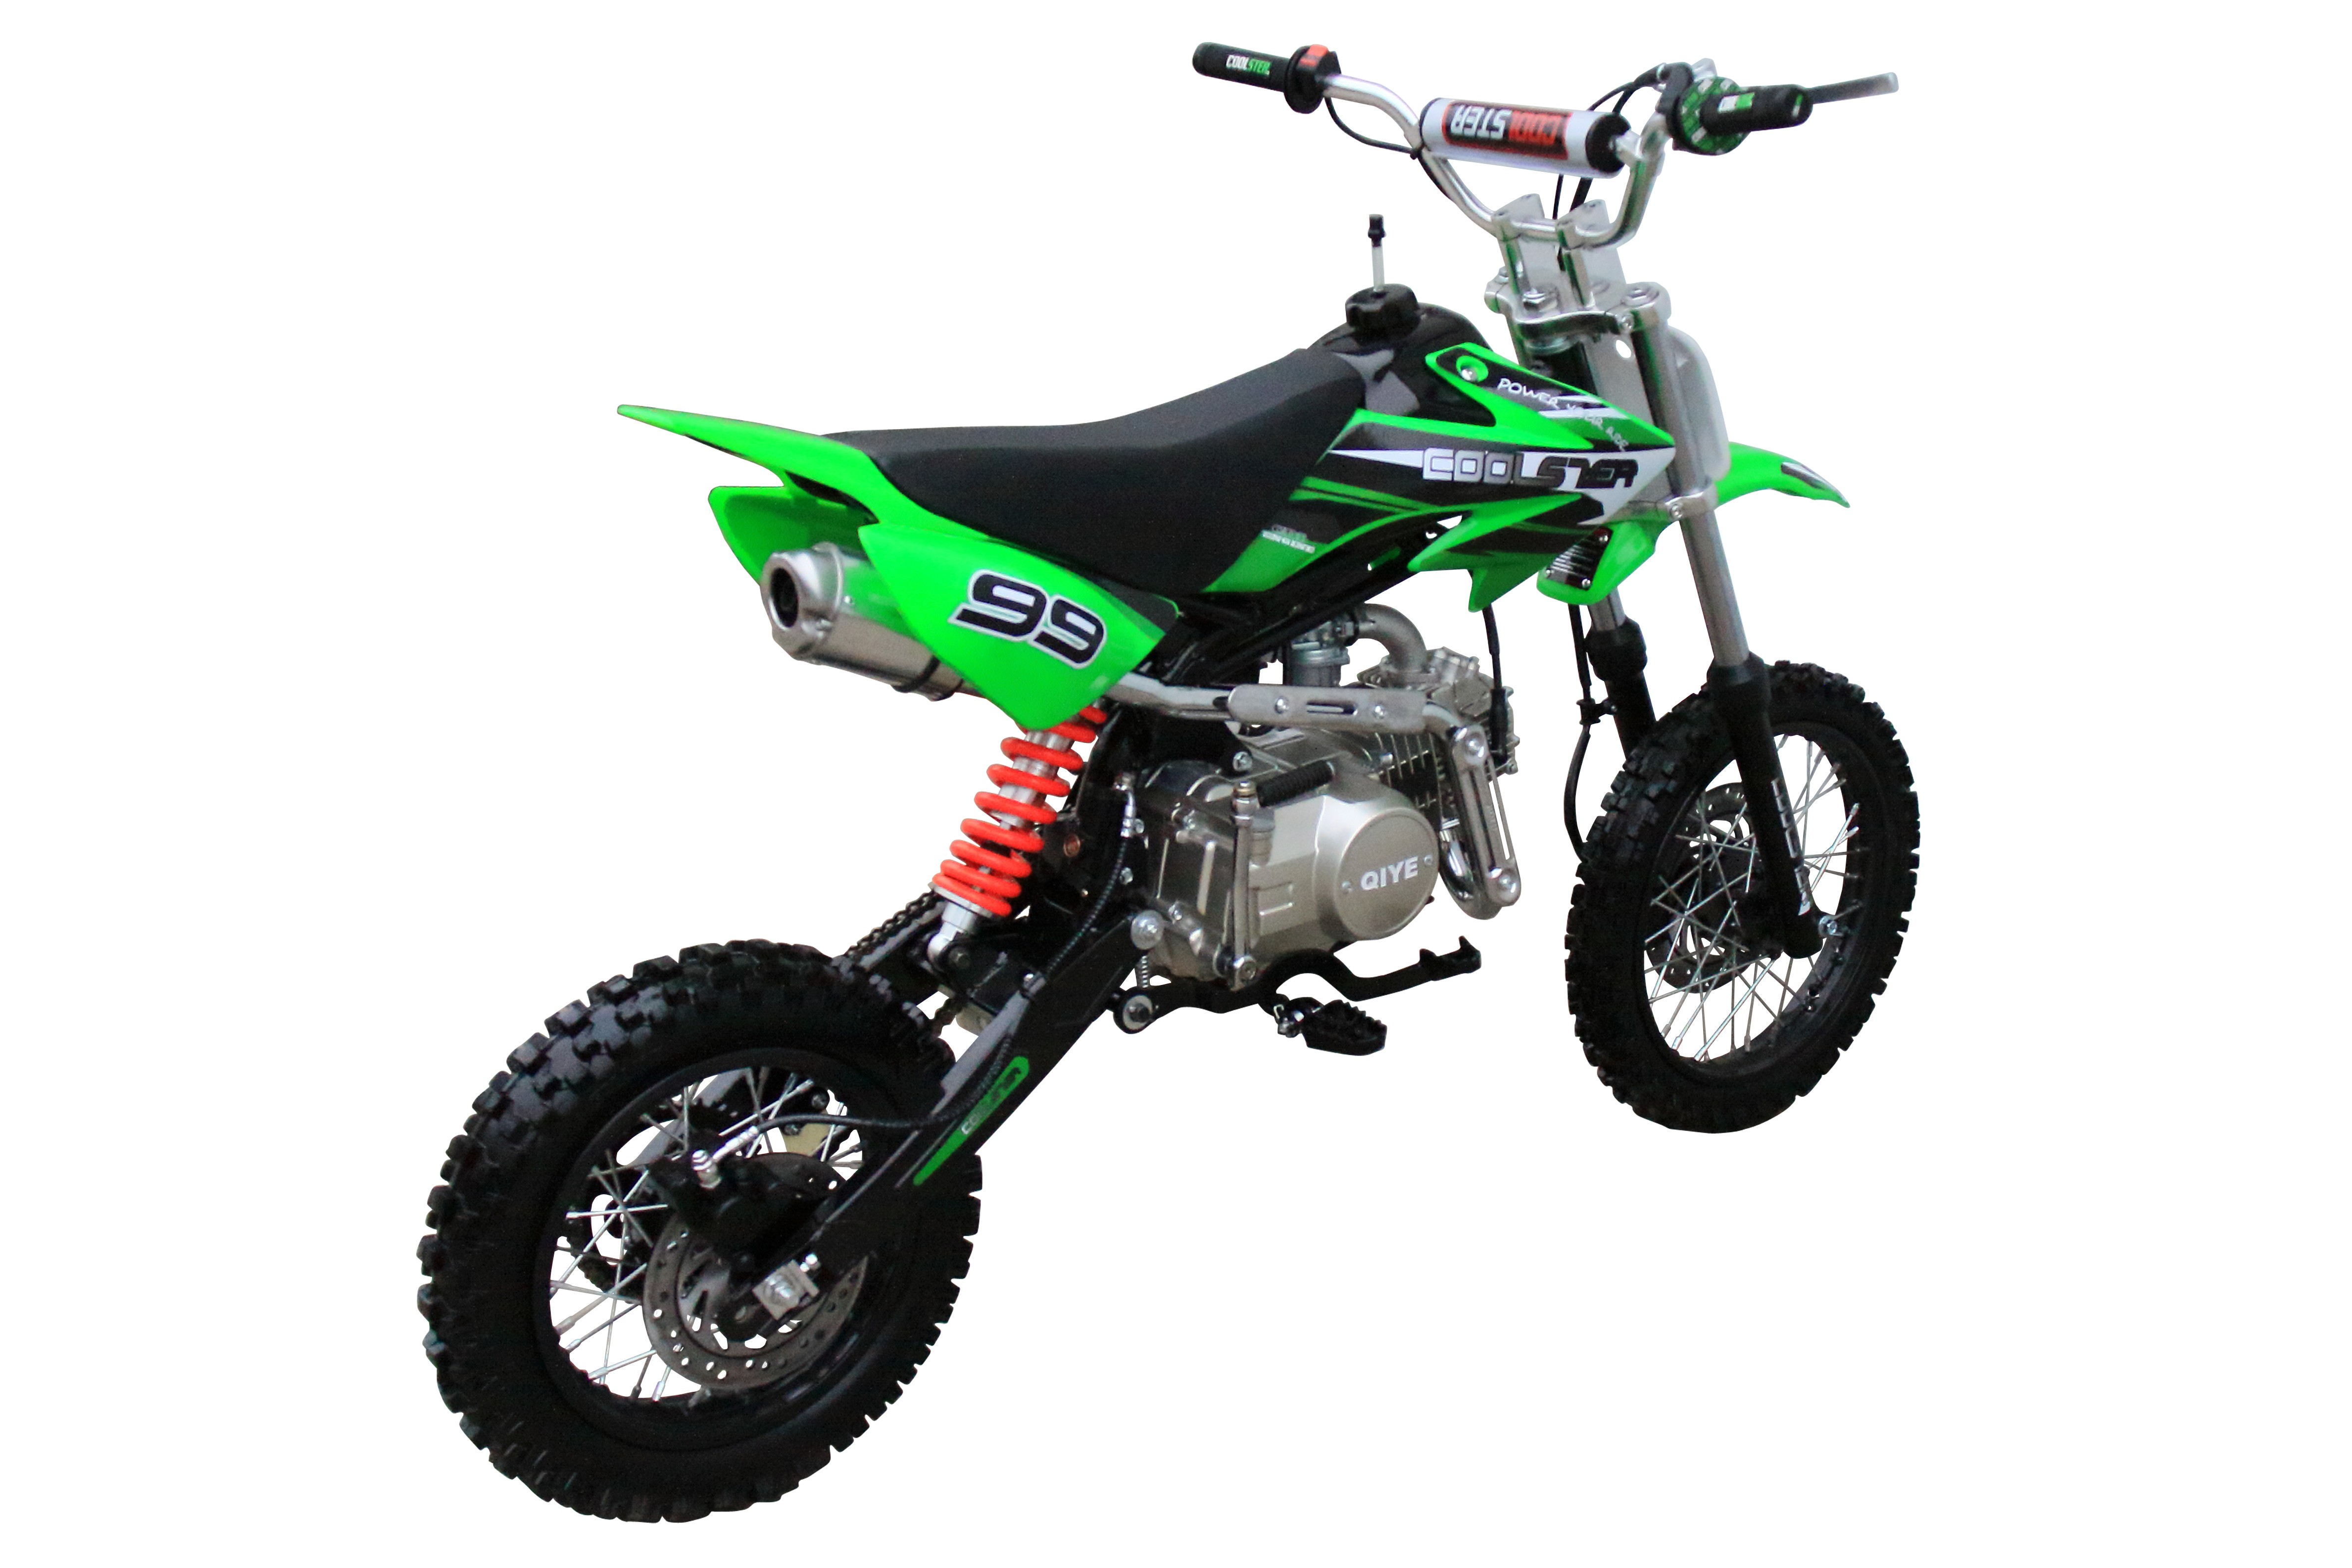 Coolster 125cc XR125 Manual Pit Dirt Bike